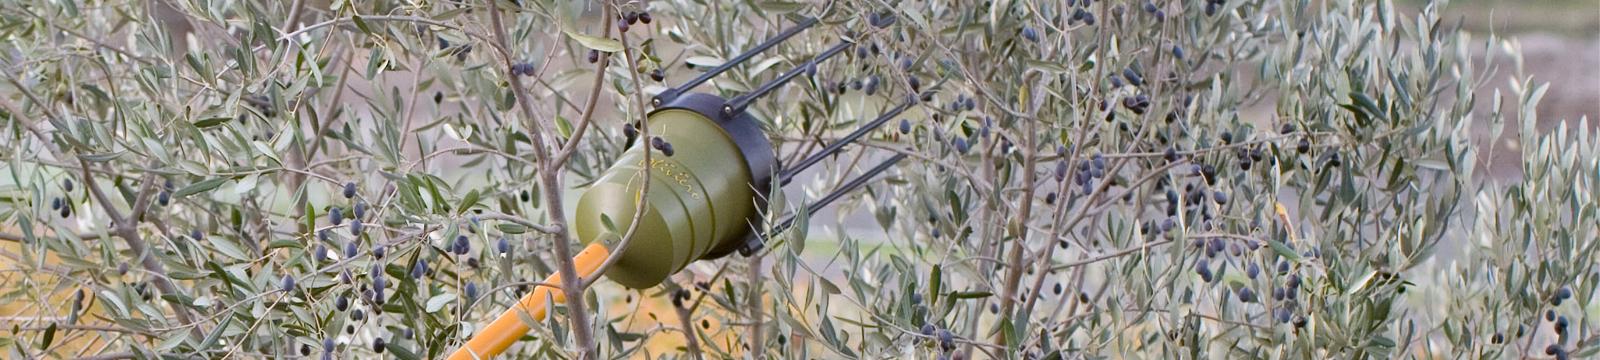 1600x360-oliveto